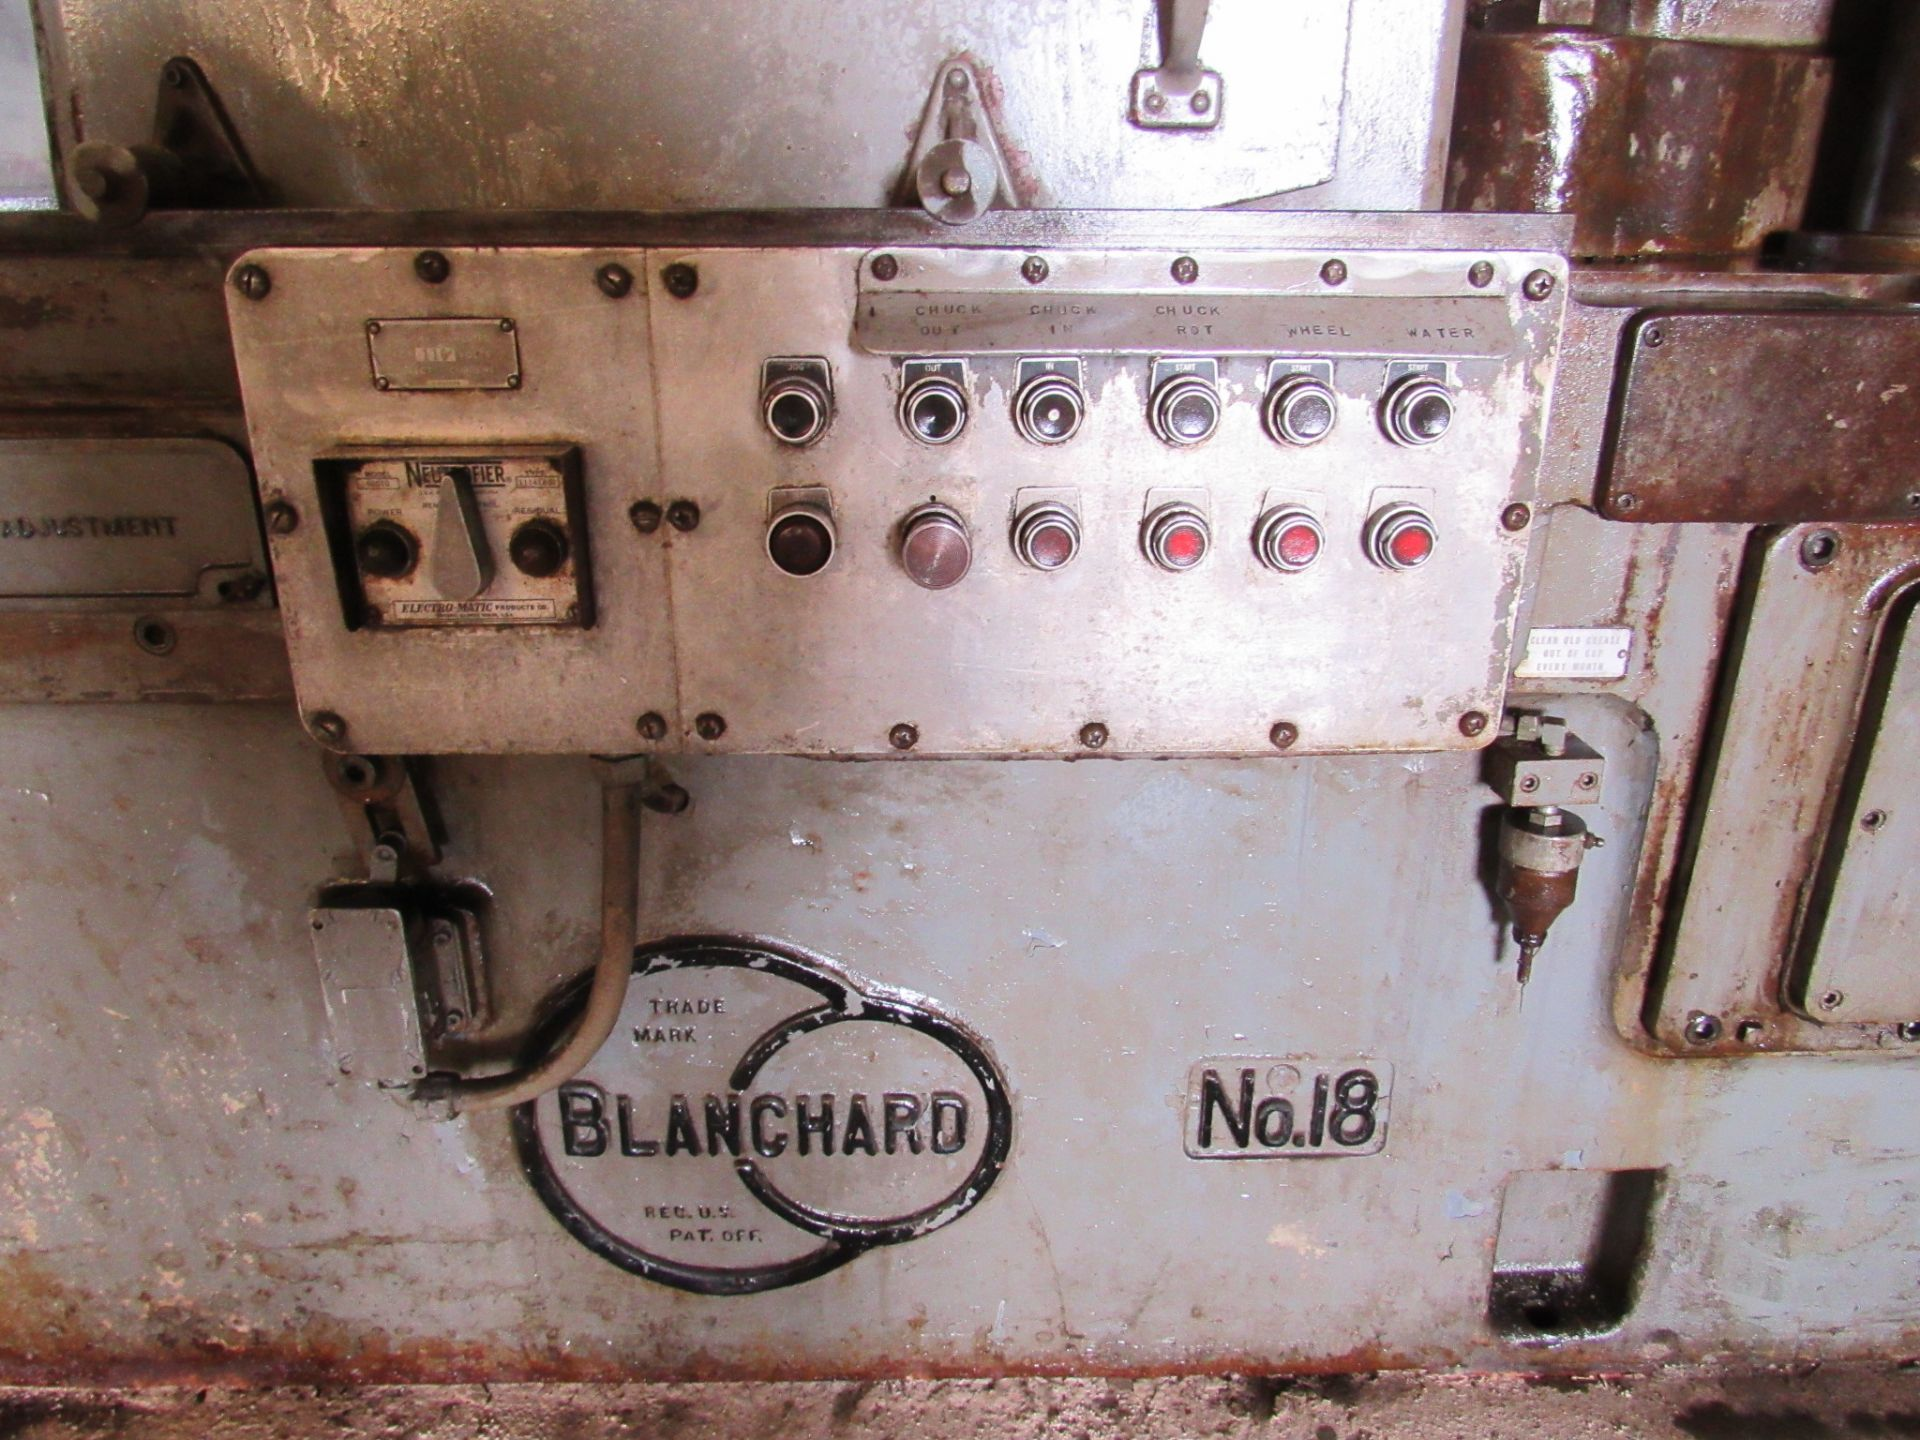 Blanchard No. 18 Rotary Surface Grinder - Image 4 of 6